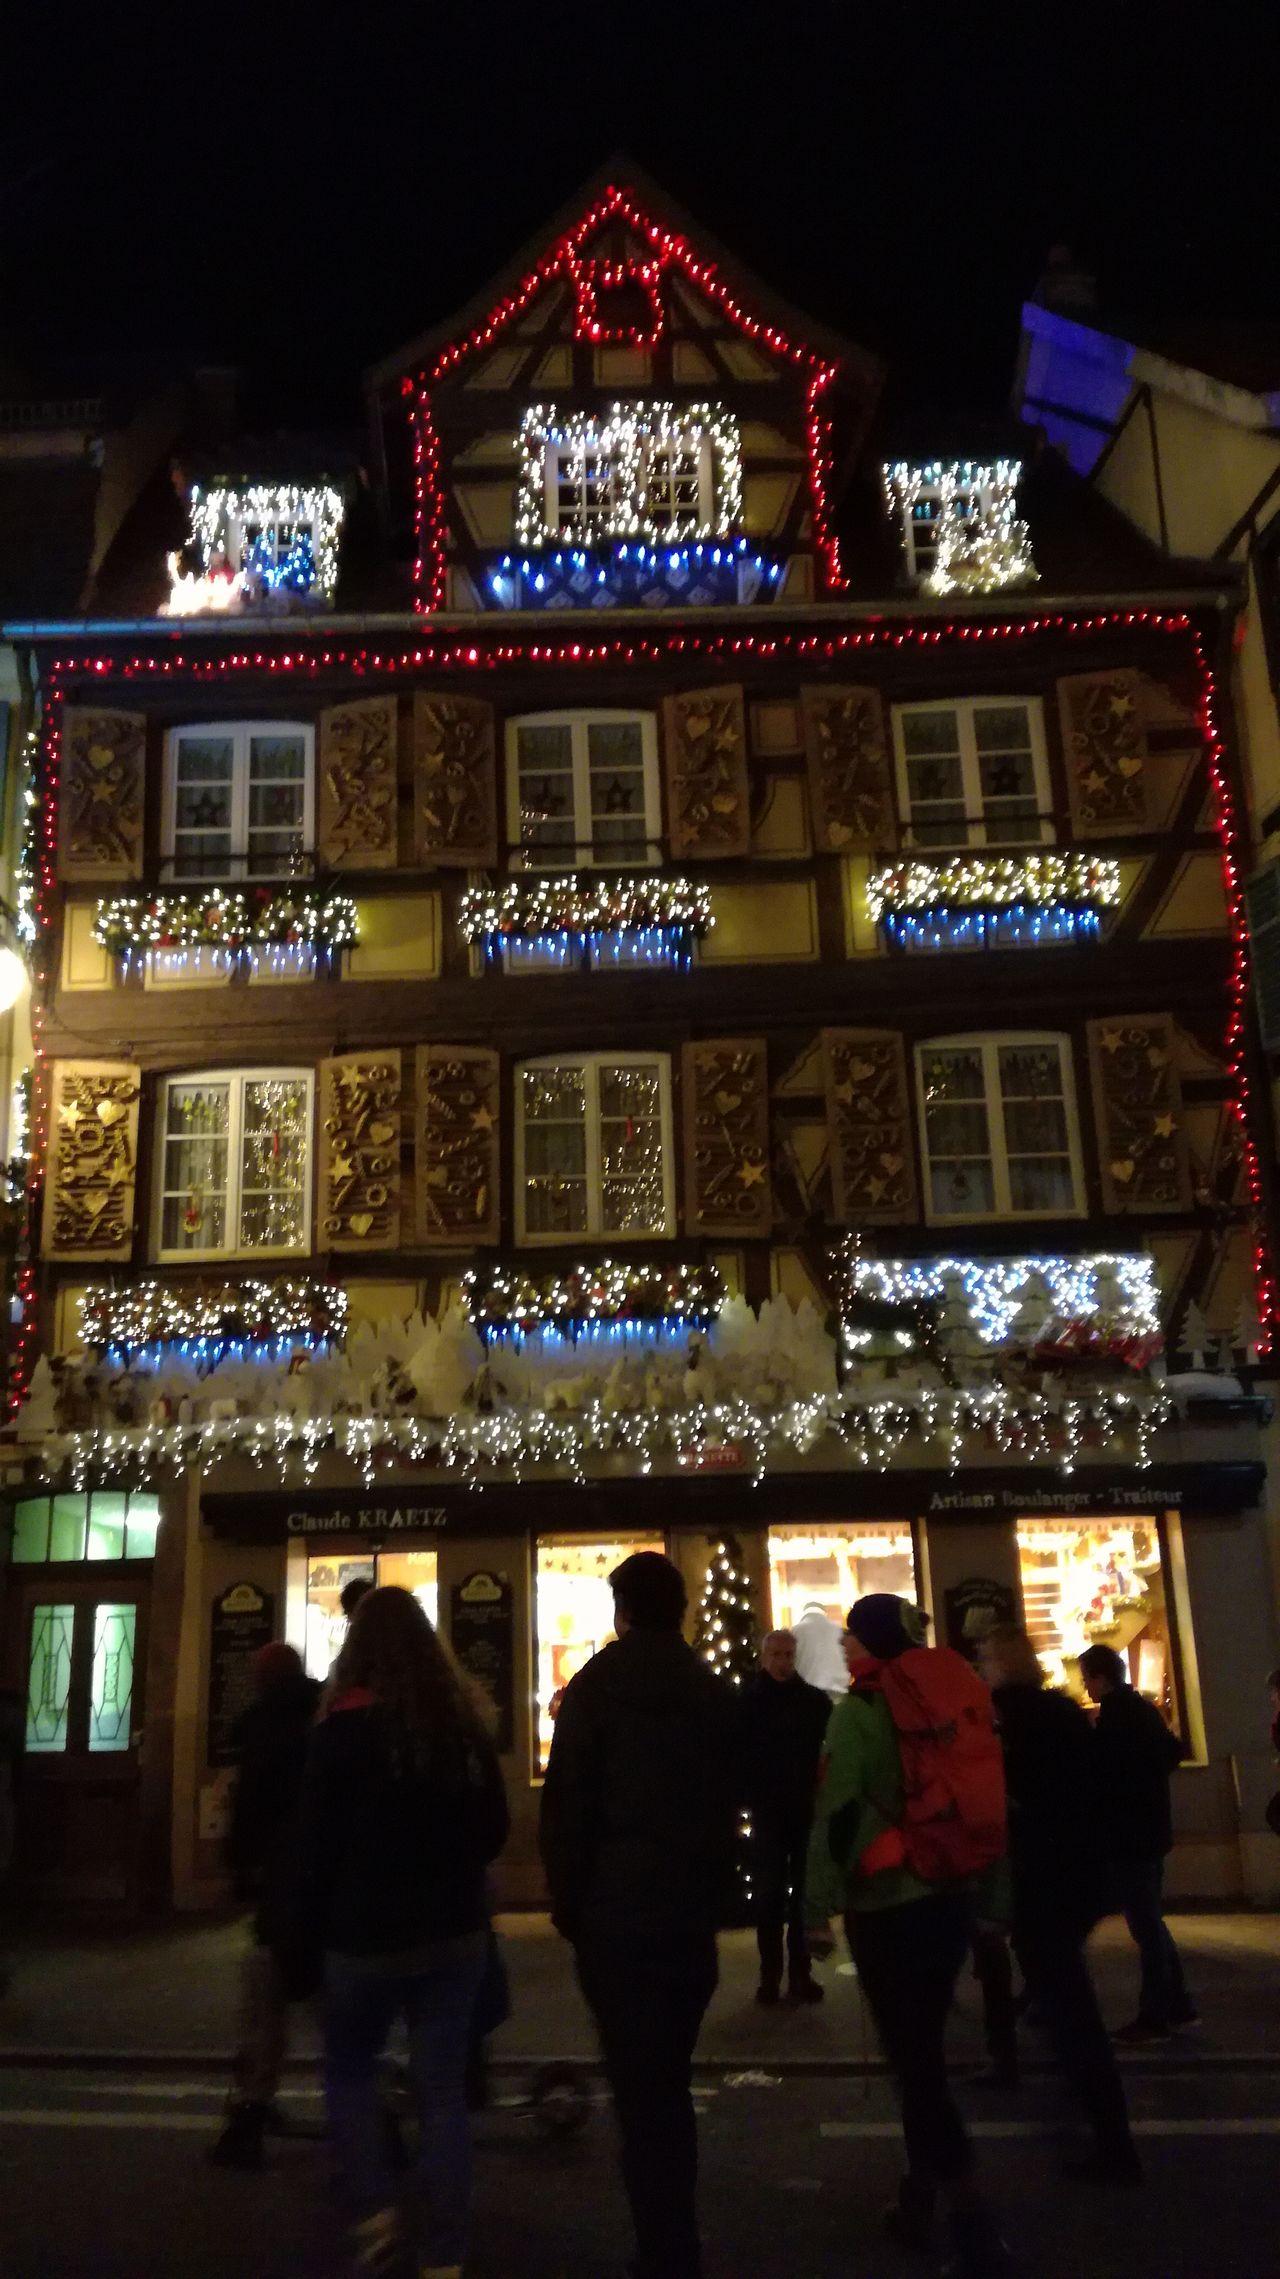 Illumination de Noël à Colmar Night Architecture Illuminated Christmas Decoration Outdoors Colmar, Alsace, France Christmas Market